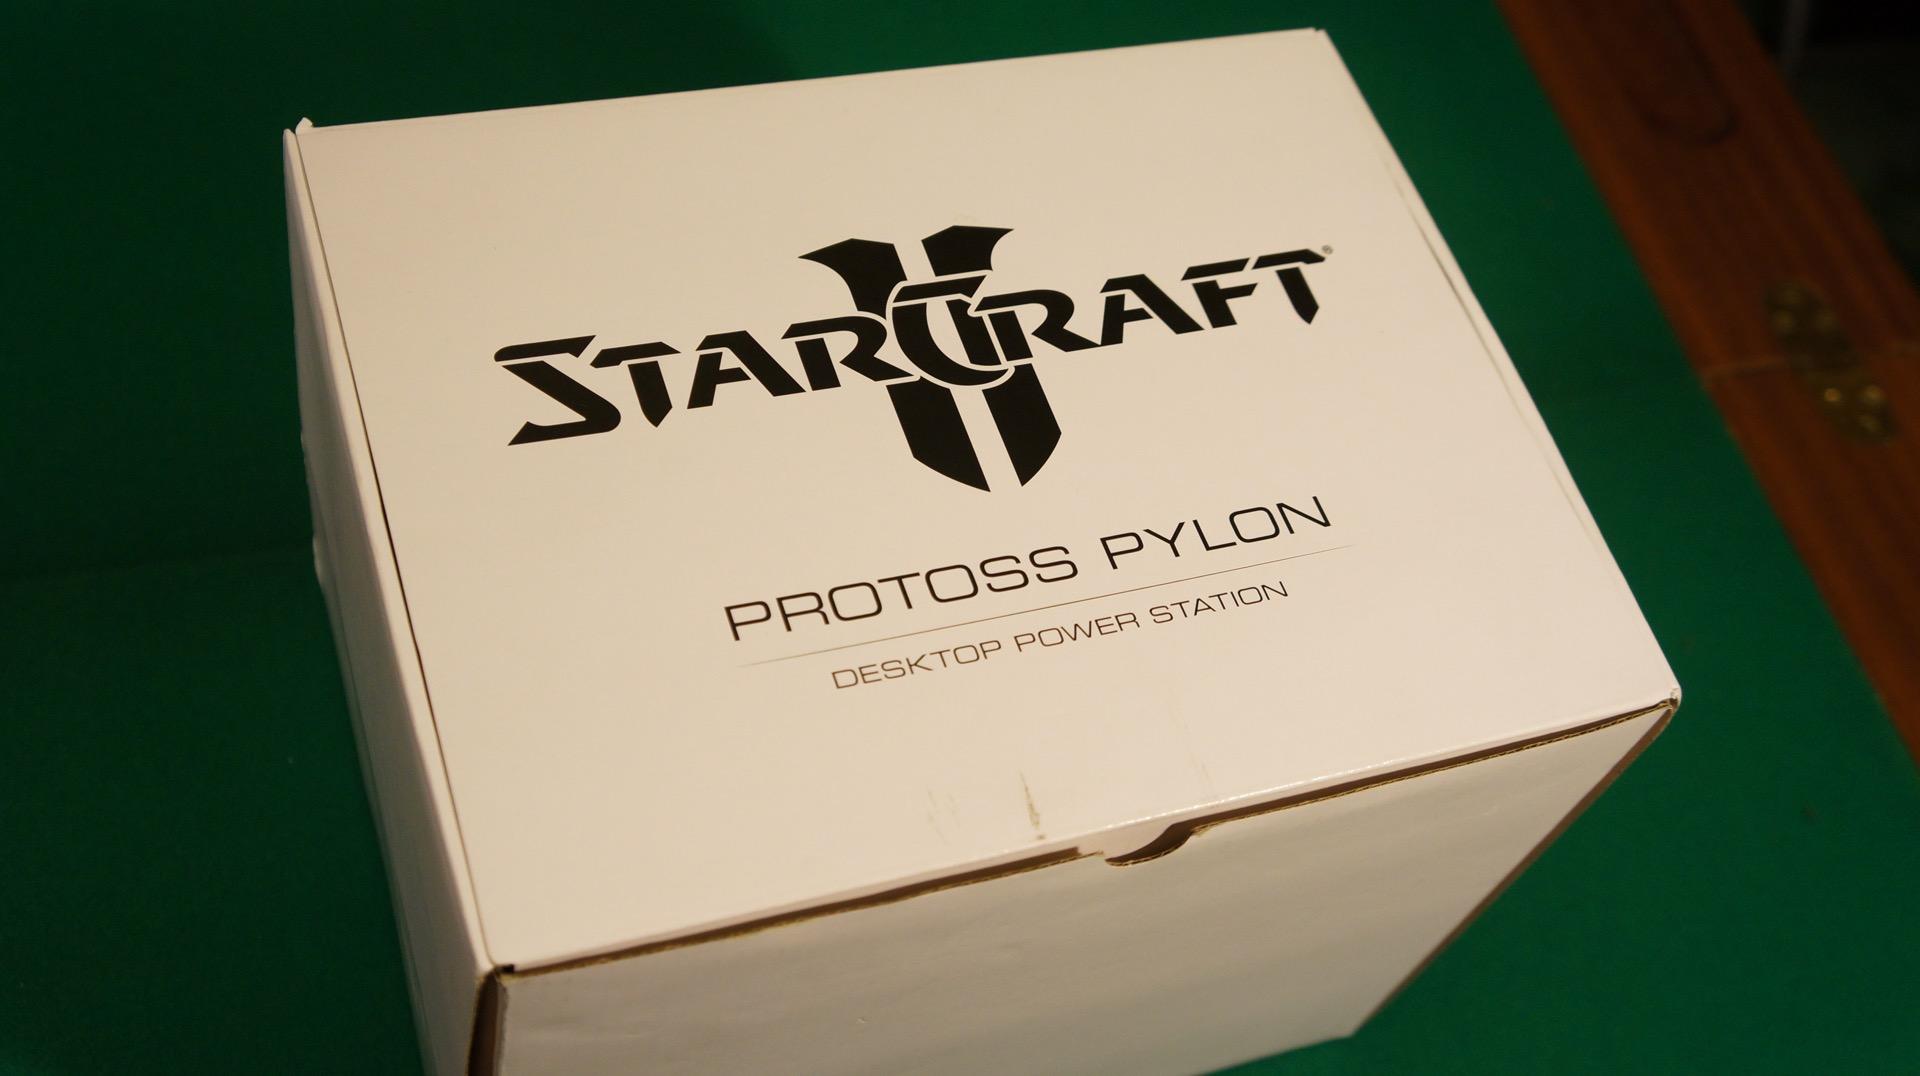 StarCraft Pylon unboxing1